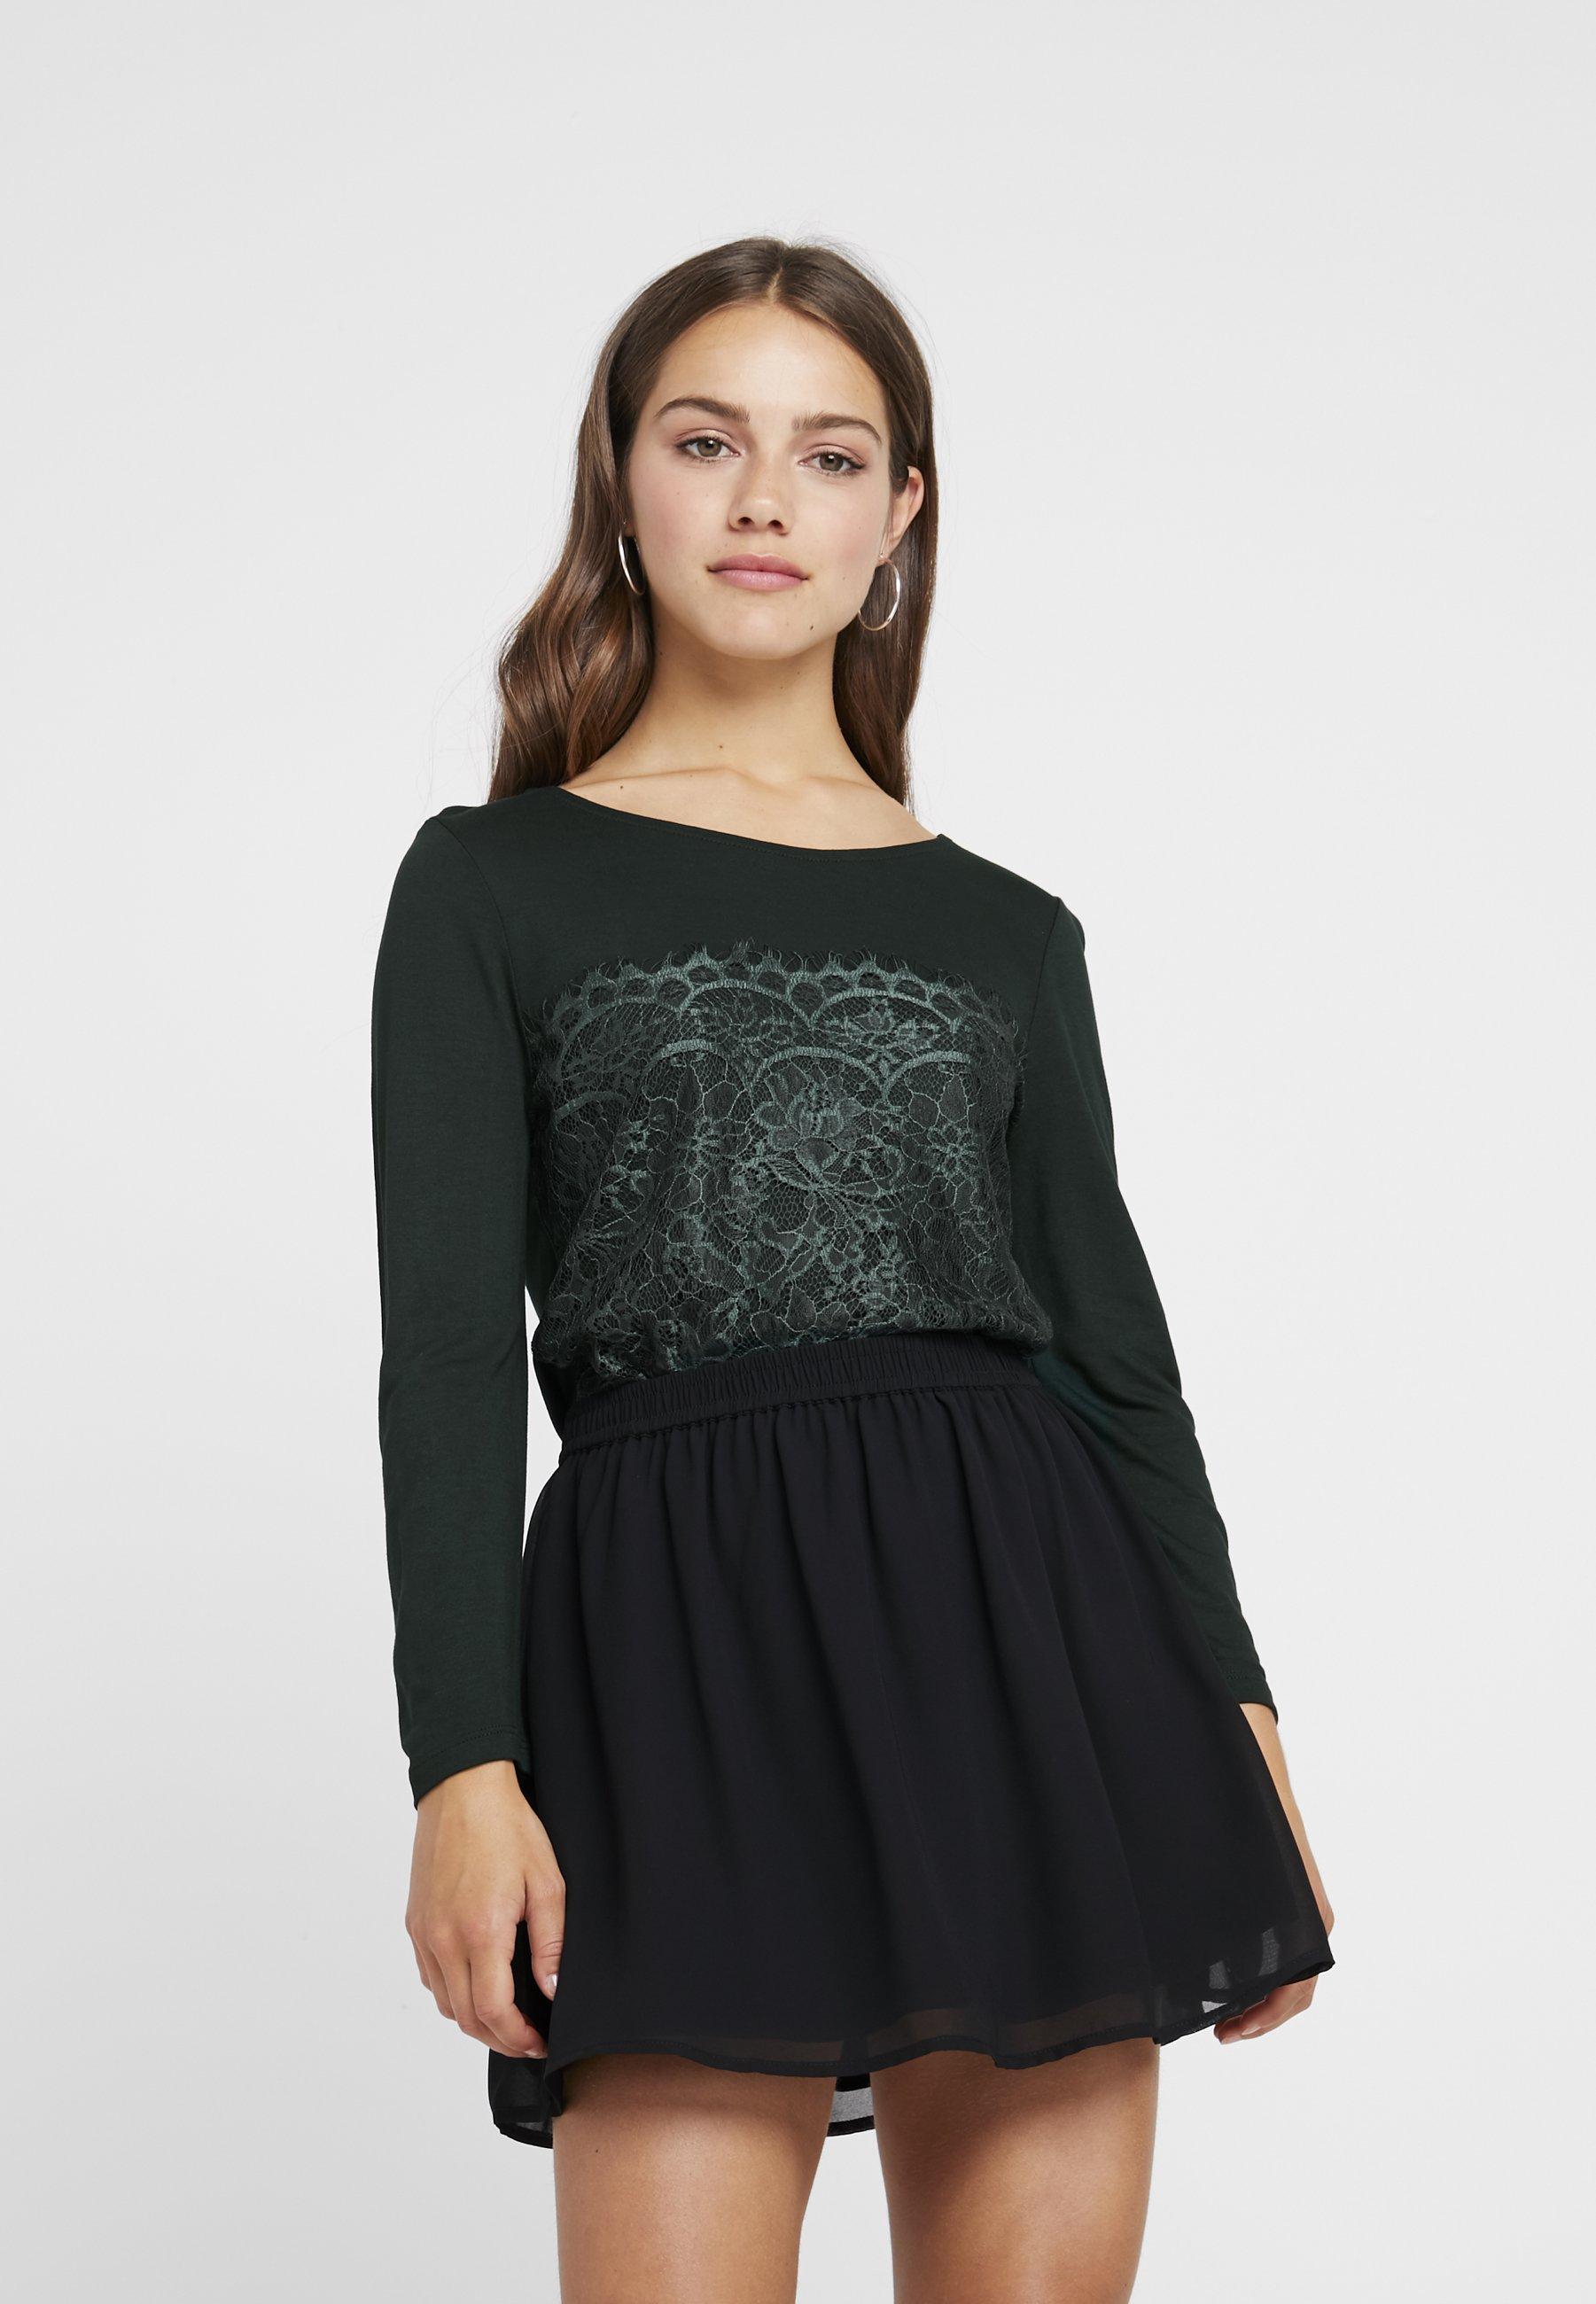 À shirt LonguesScarab T Anna Petite Field Manches oCdBxe